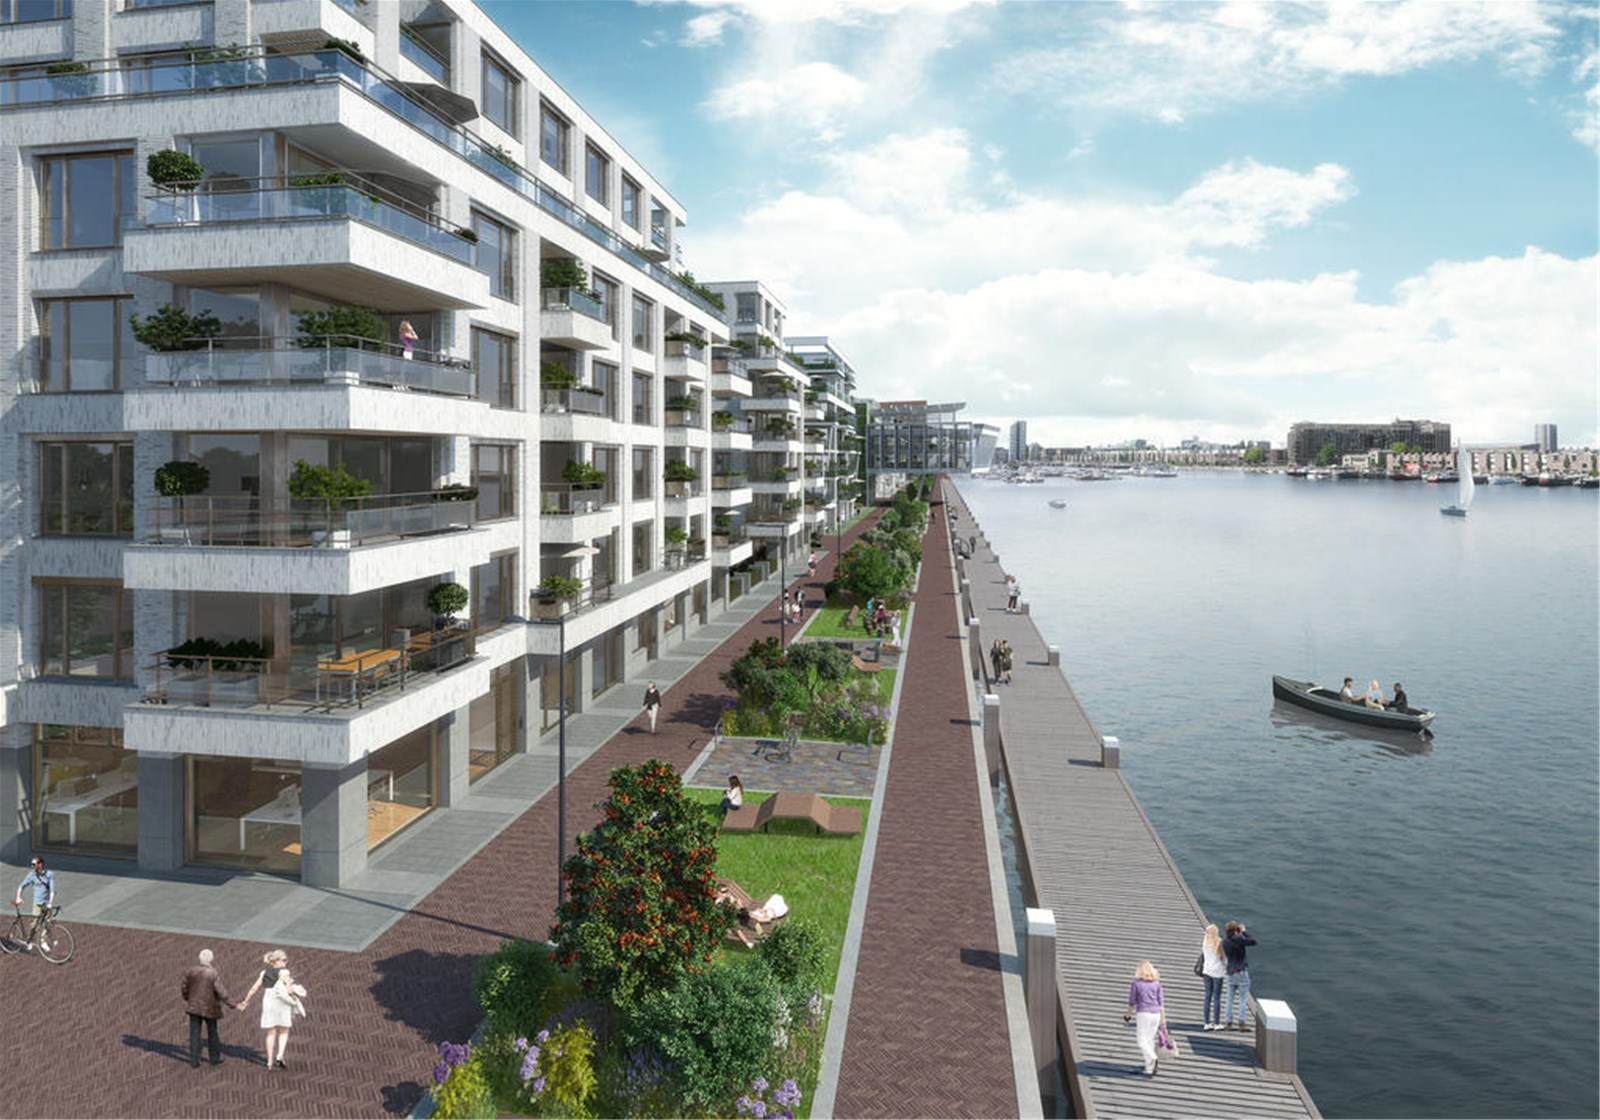 Nieuwbouw project Cruquius 1.1 van - Makelaarsvereniging Amsterdam MVA